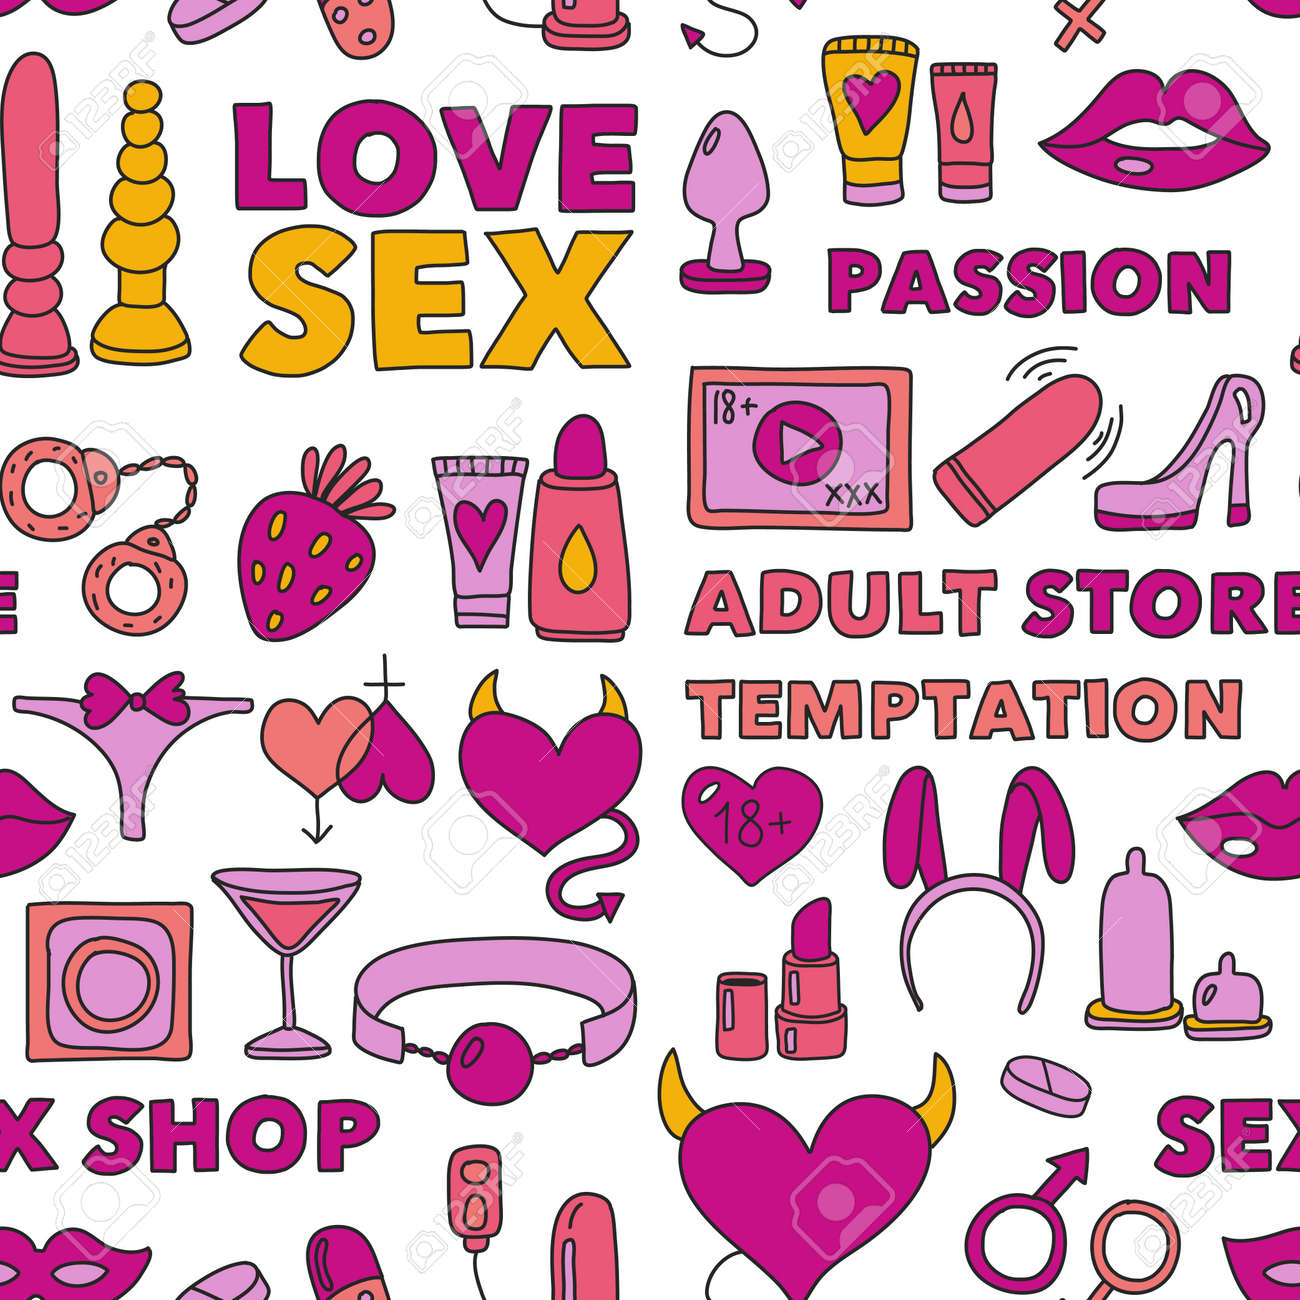 www adult shop